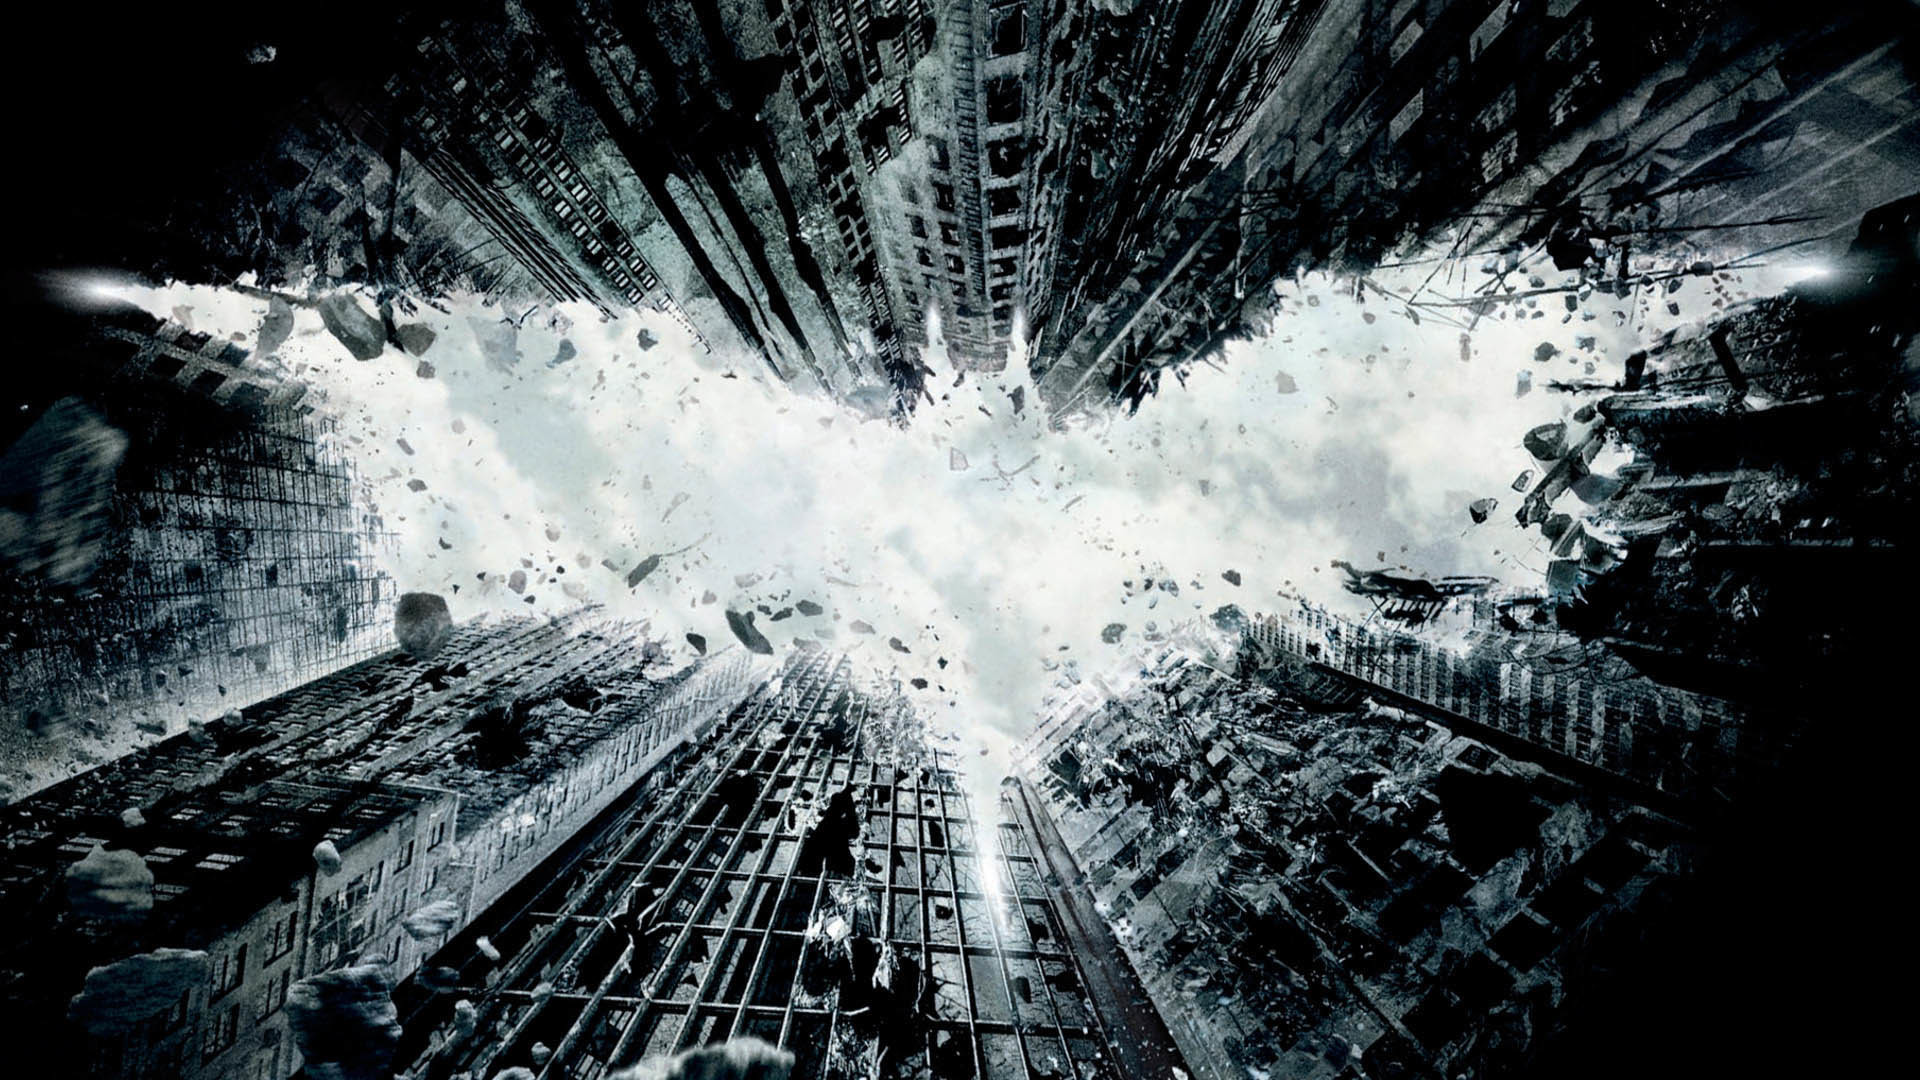 1920x1080 Wallpapers For The Dark Knight Rises Wallpaper Batman